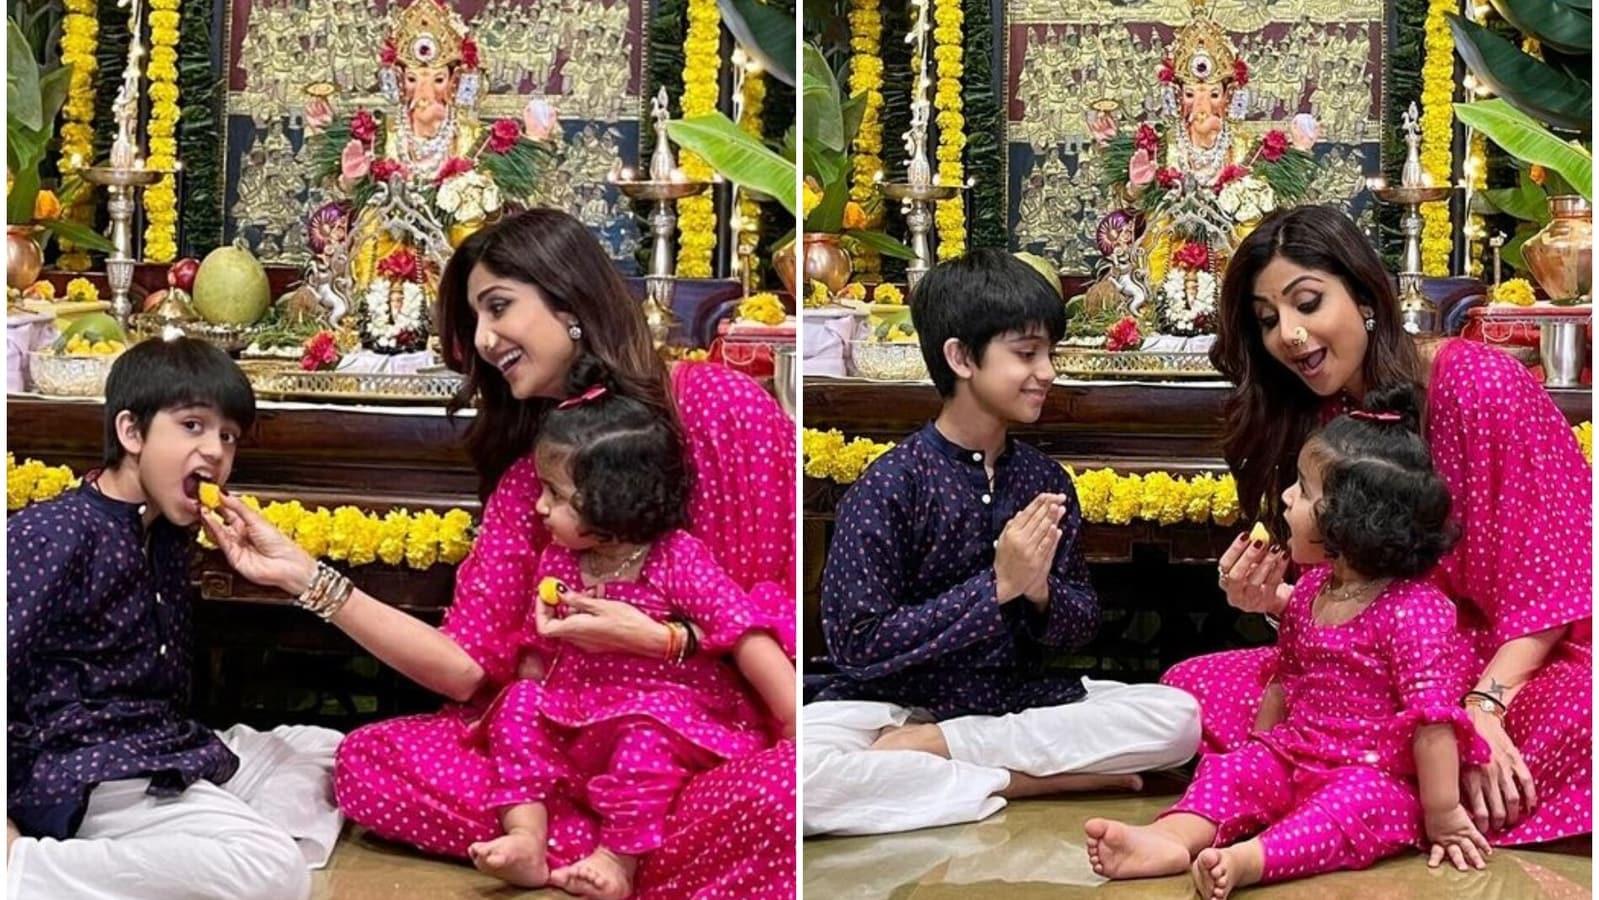 Shilpa Shetty twins with daughter Samisha at Ganesh Chaturthi celebrations, feeds son Viaan laddoo. See photos   Bollywood - Hindustan Times